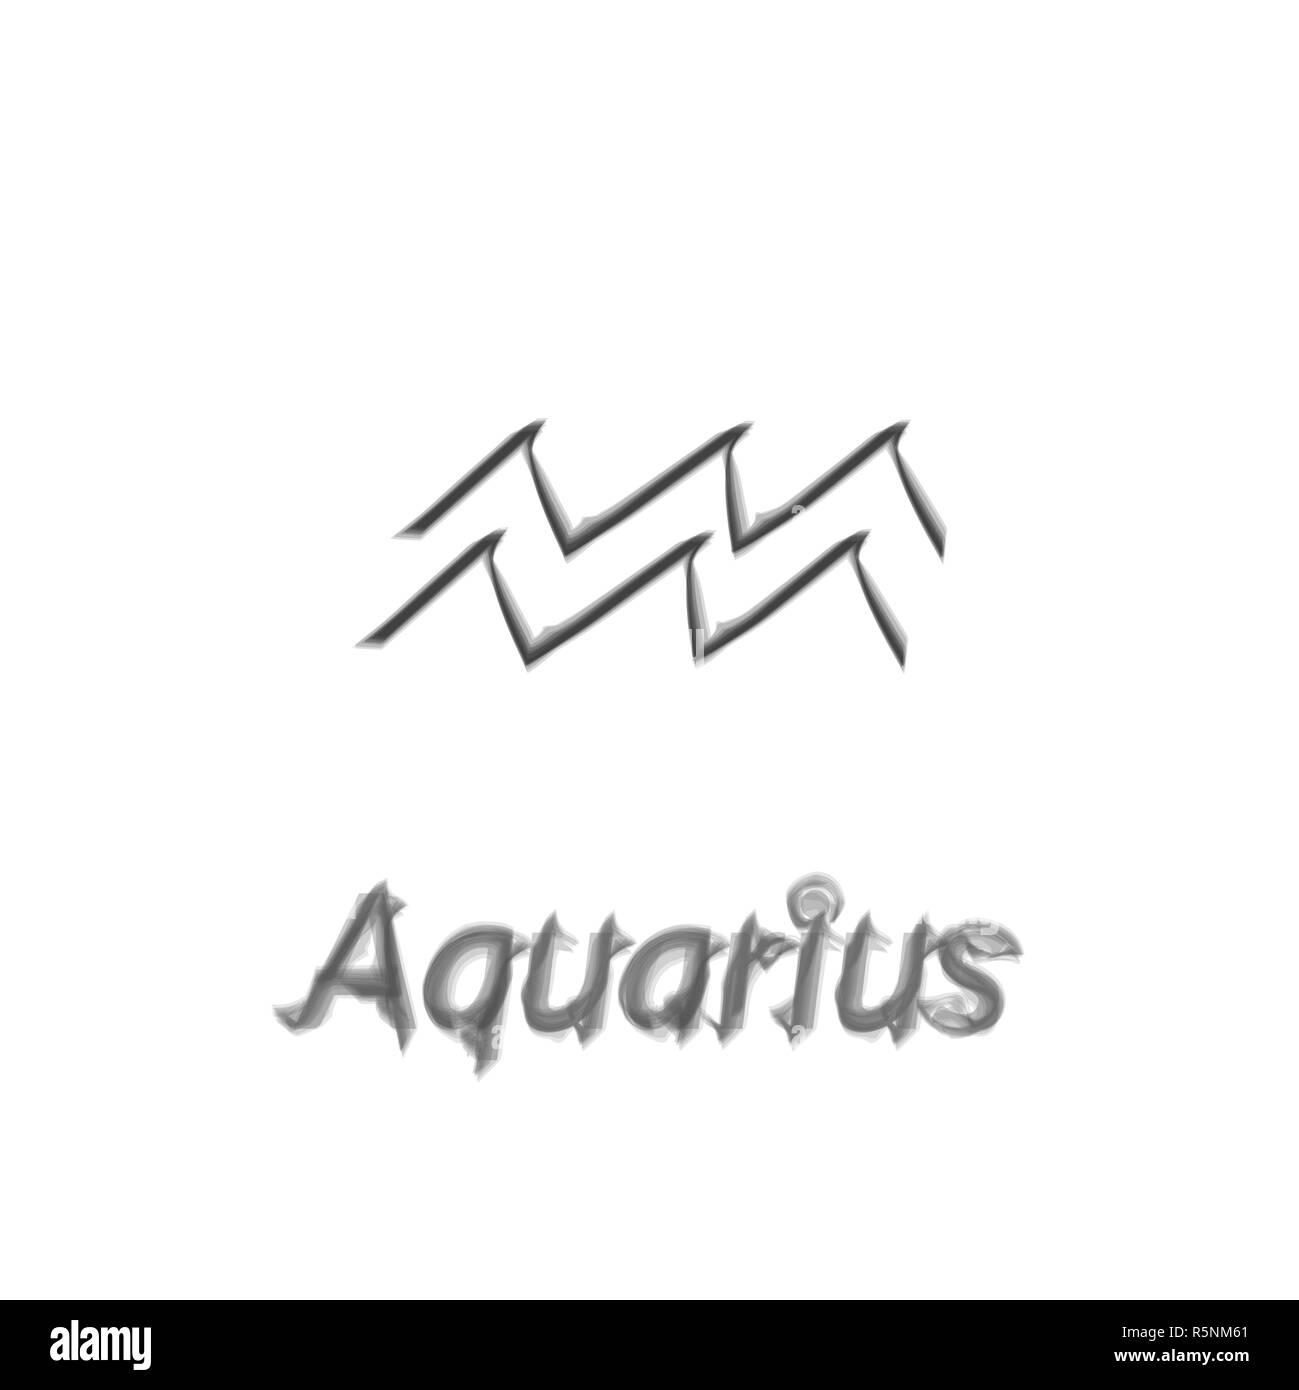 The Water-Bearer aquarius sing. Star constellation vector element. Age of aquarius constellation zodiac symbol on light background. Stock Photo